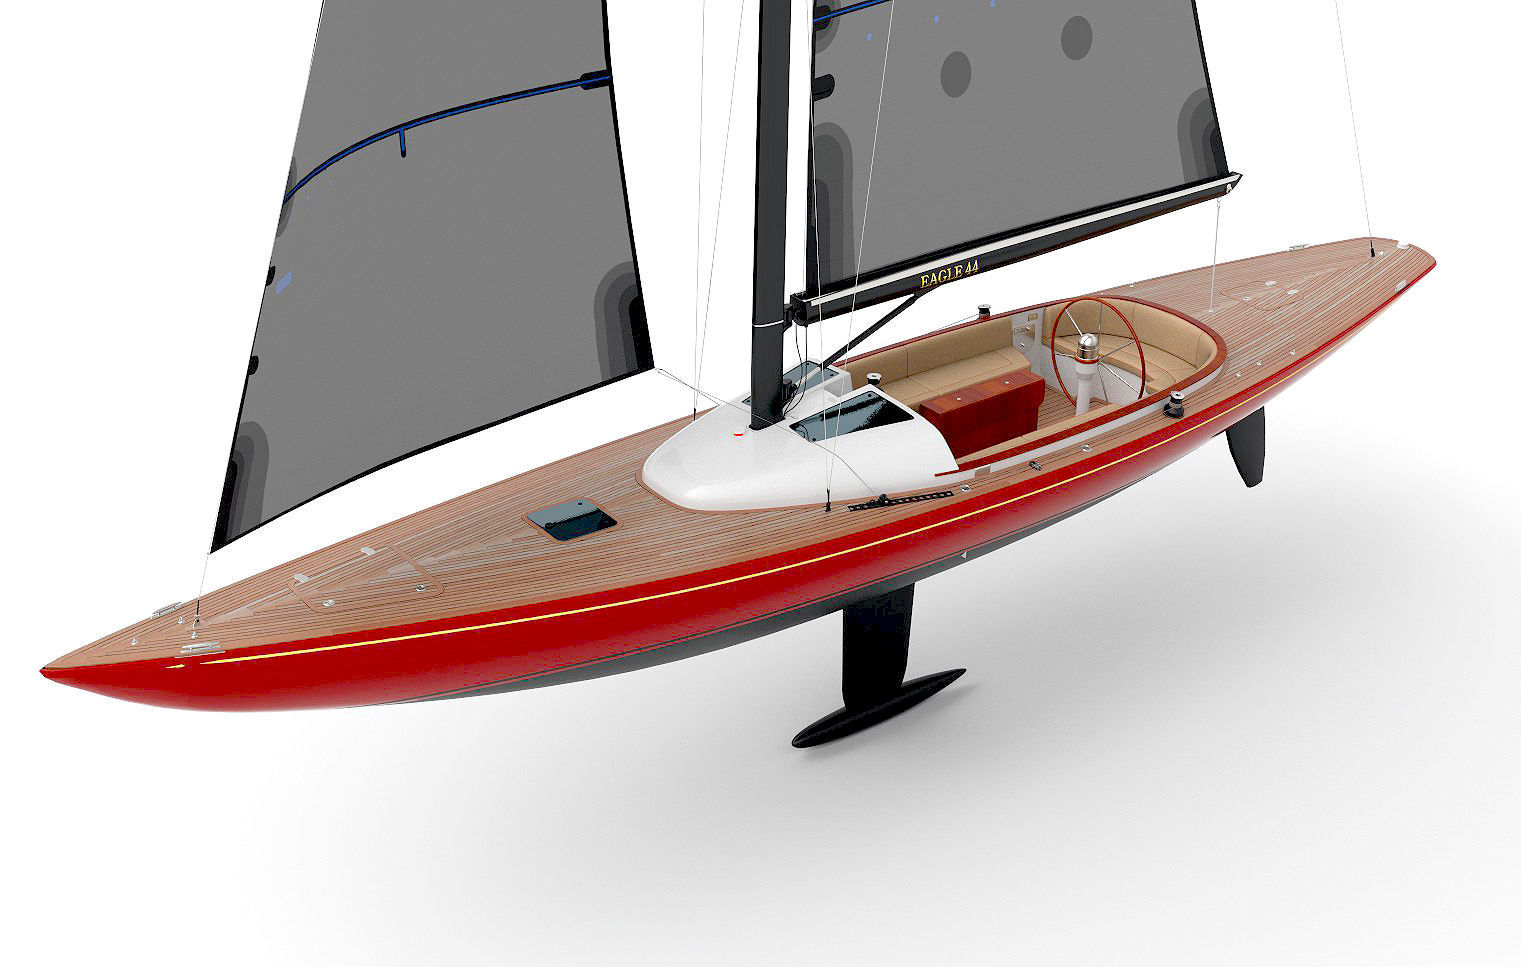 Leonardo yachts Eagle 44 RED